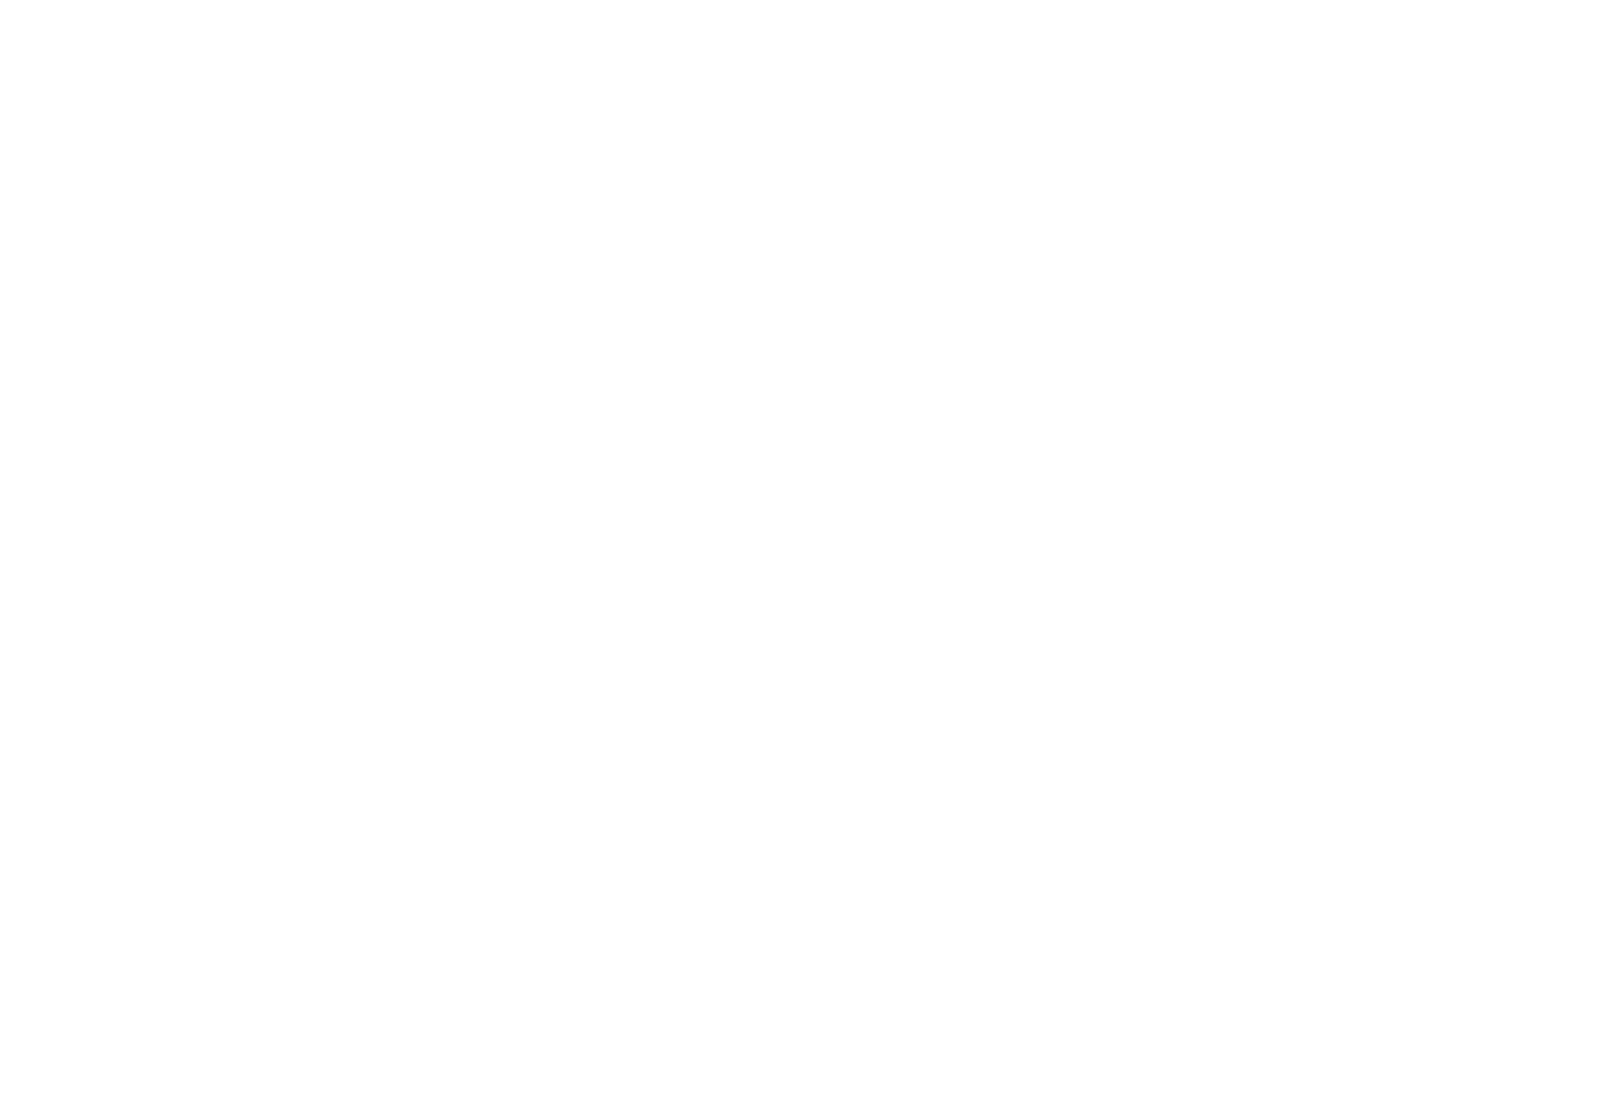 ILLUMINATE Film Festival's Silver Linings Screening Series